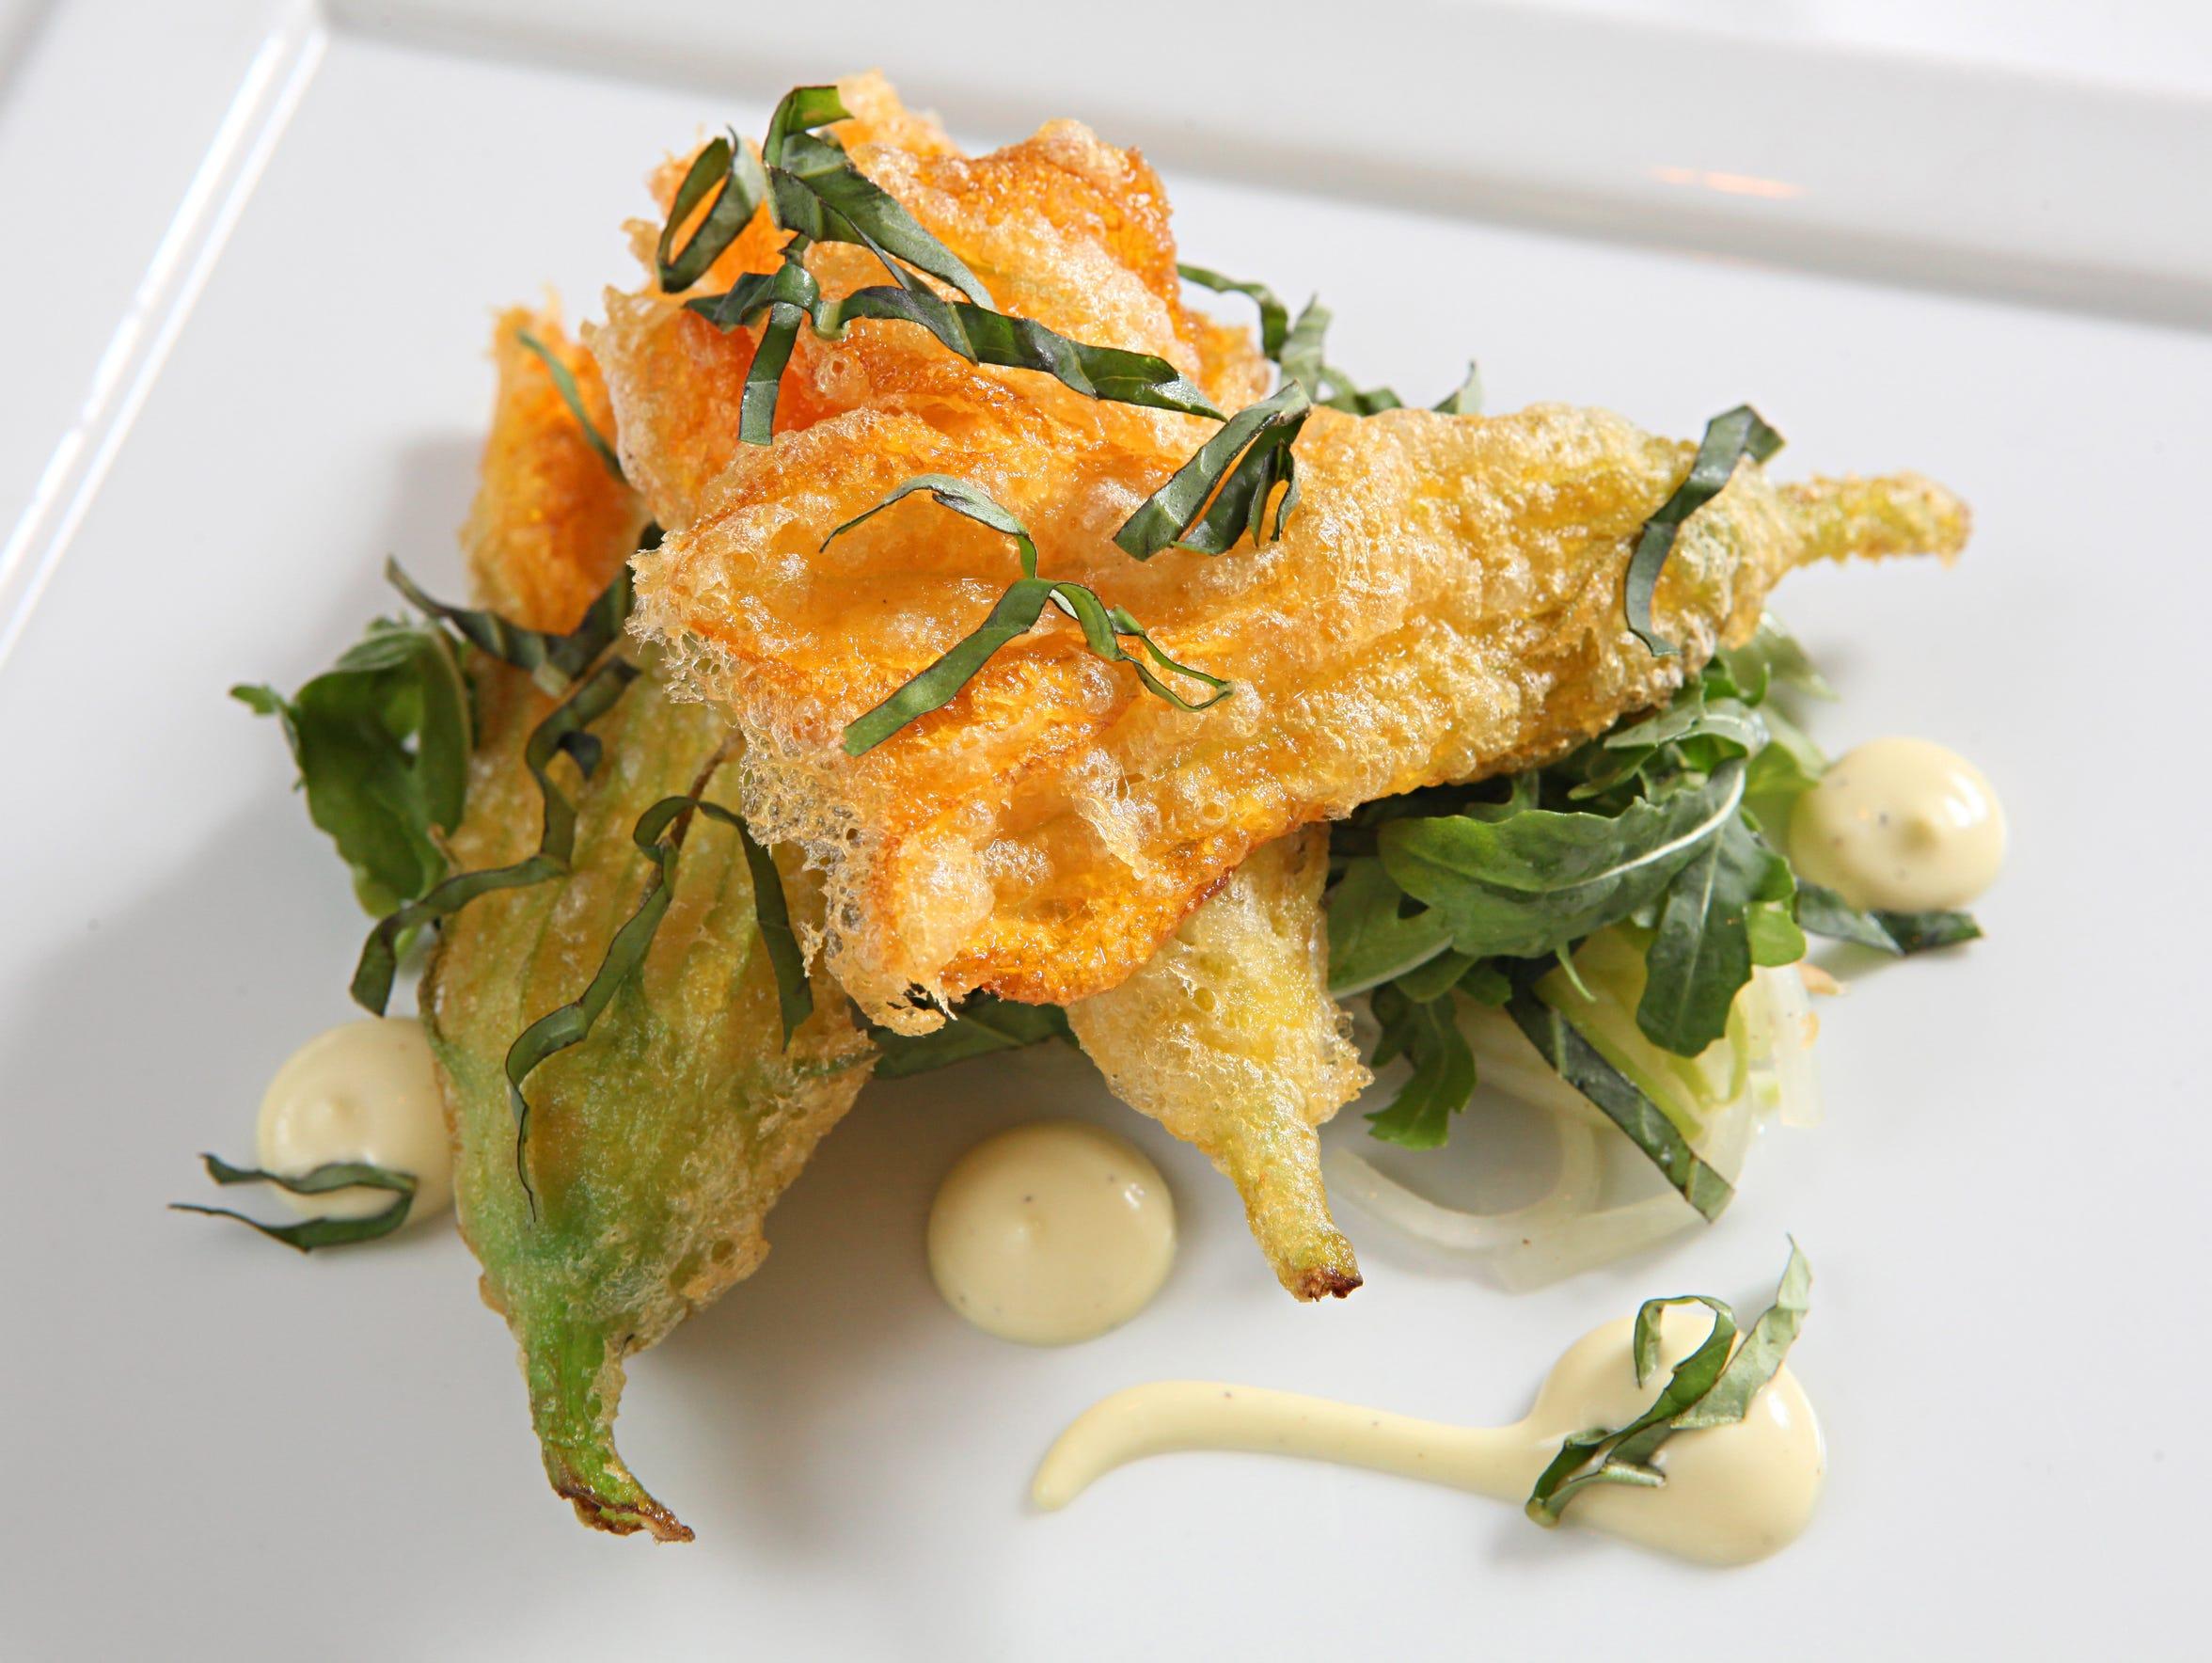 Sanford Restaurant in Milwaukee offers fried squash